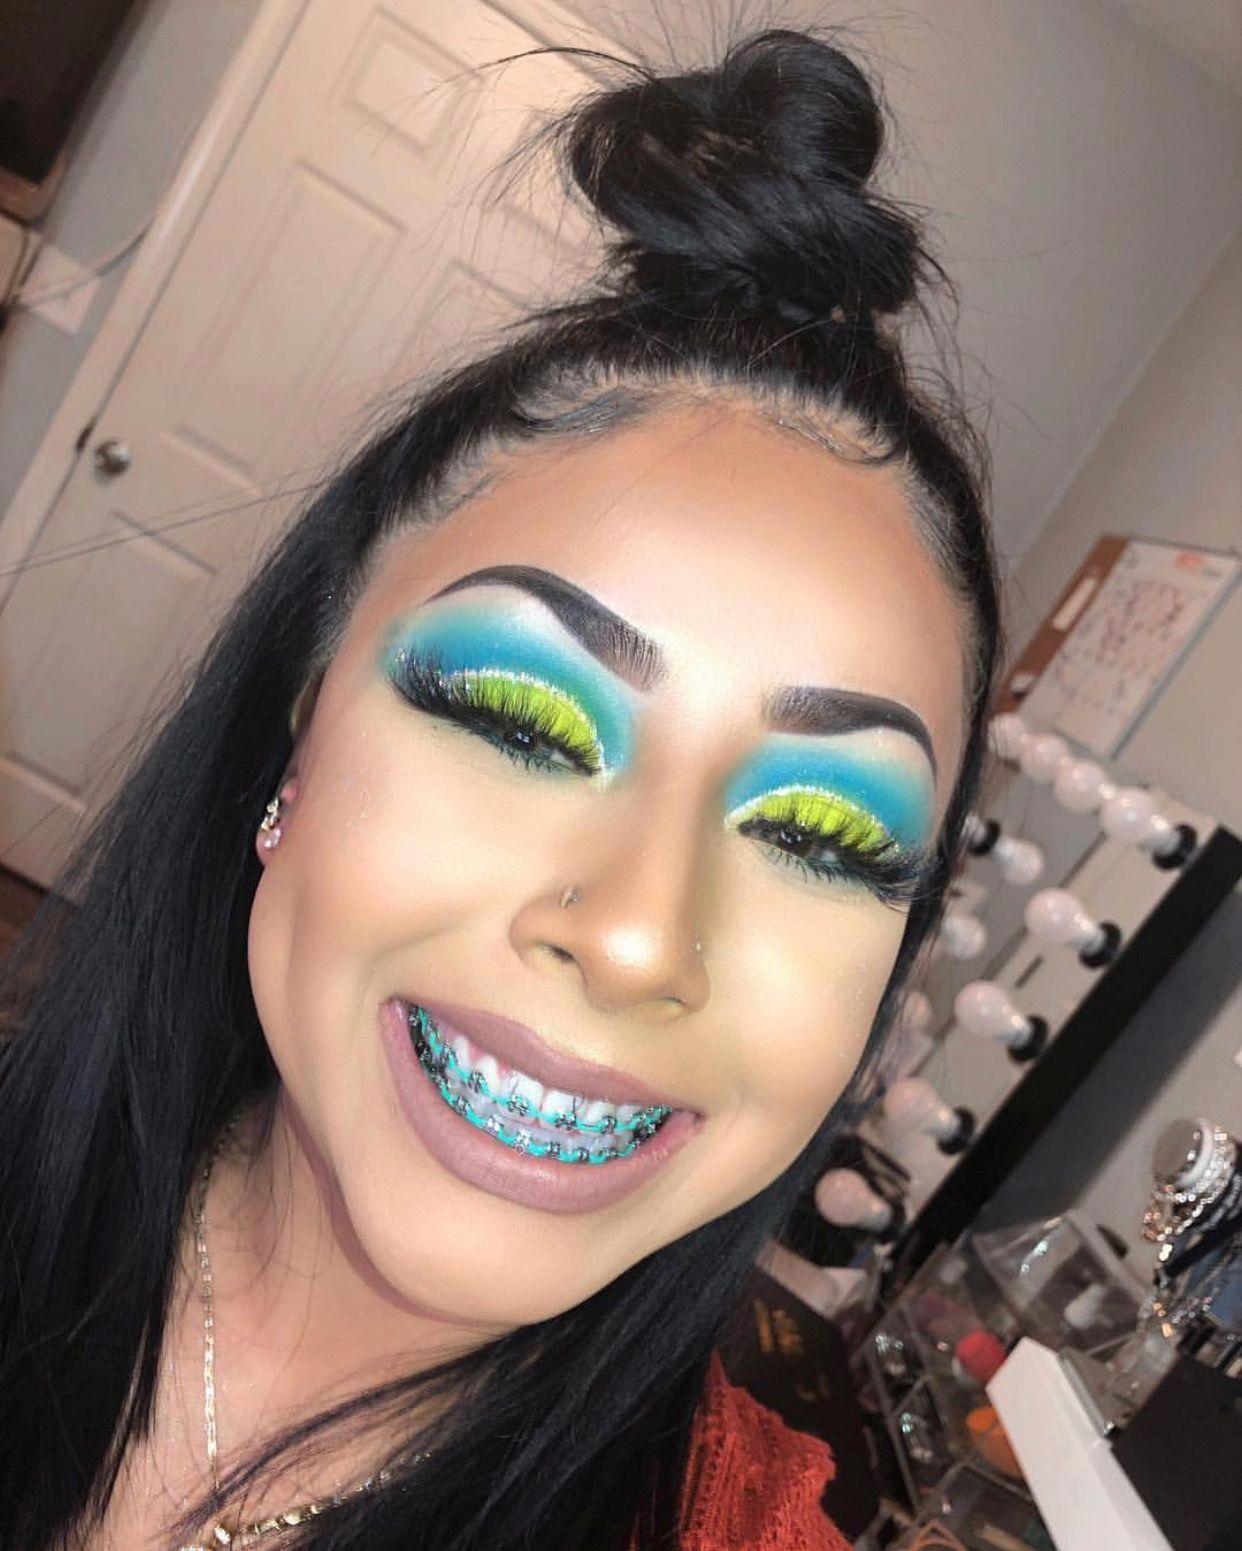 Follow Tropic M For More Instagram Glizzypostedthat Originaleyemakeup Makeup Eye Makeup Cute Braces